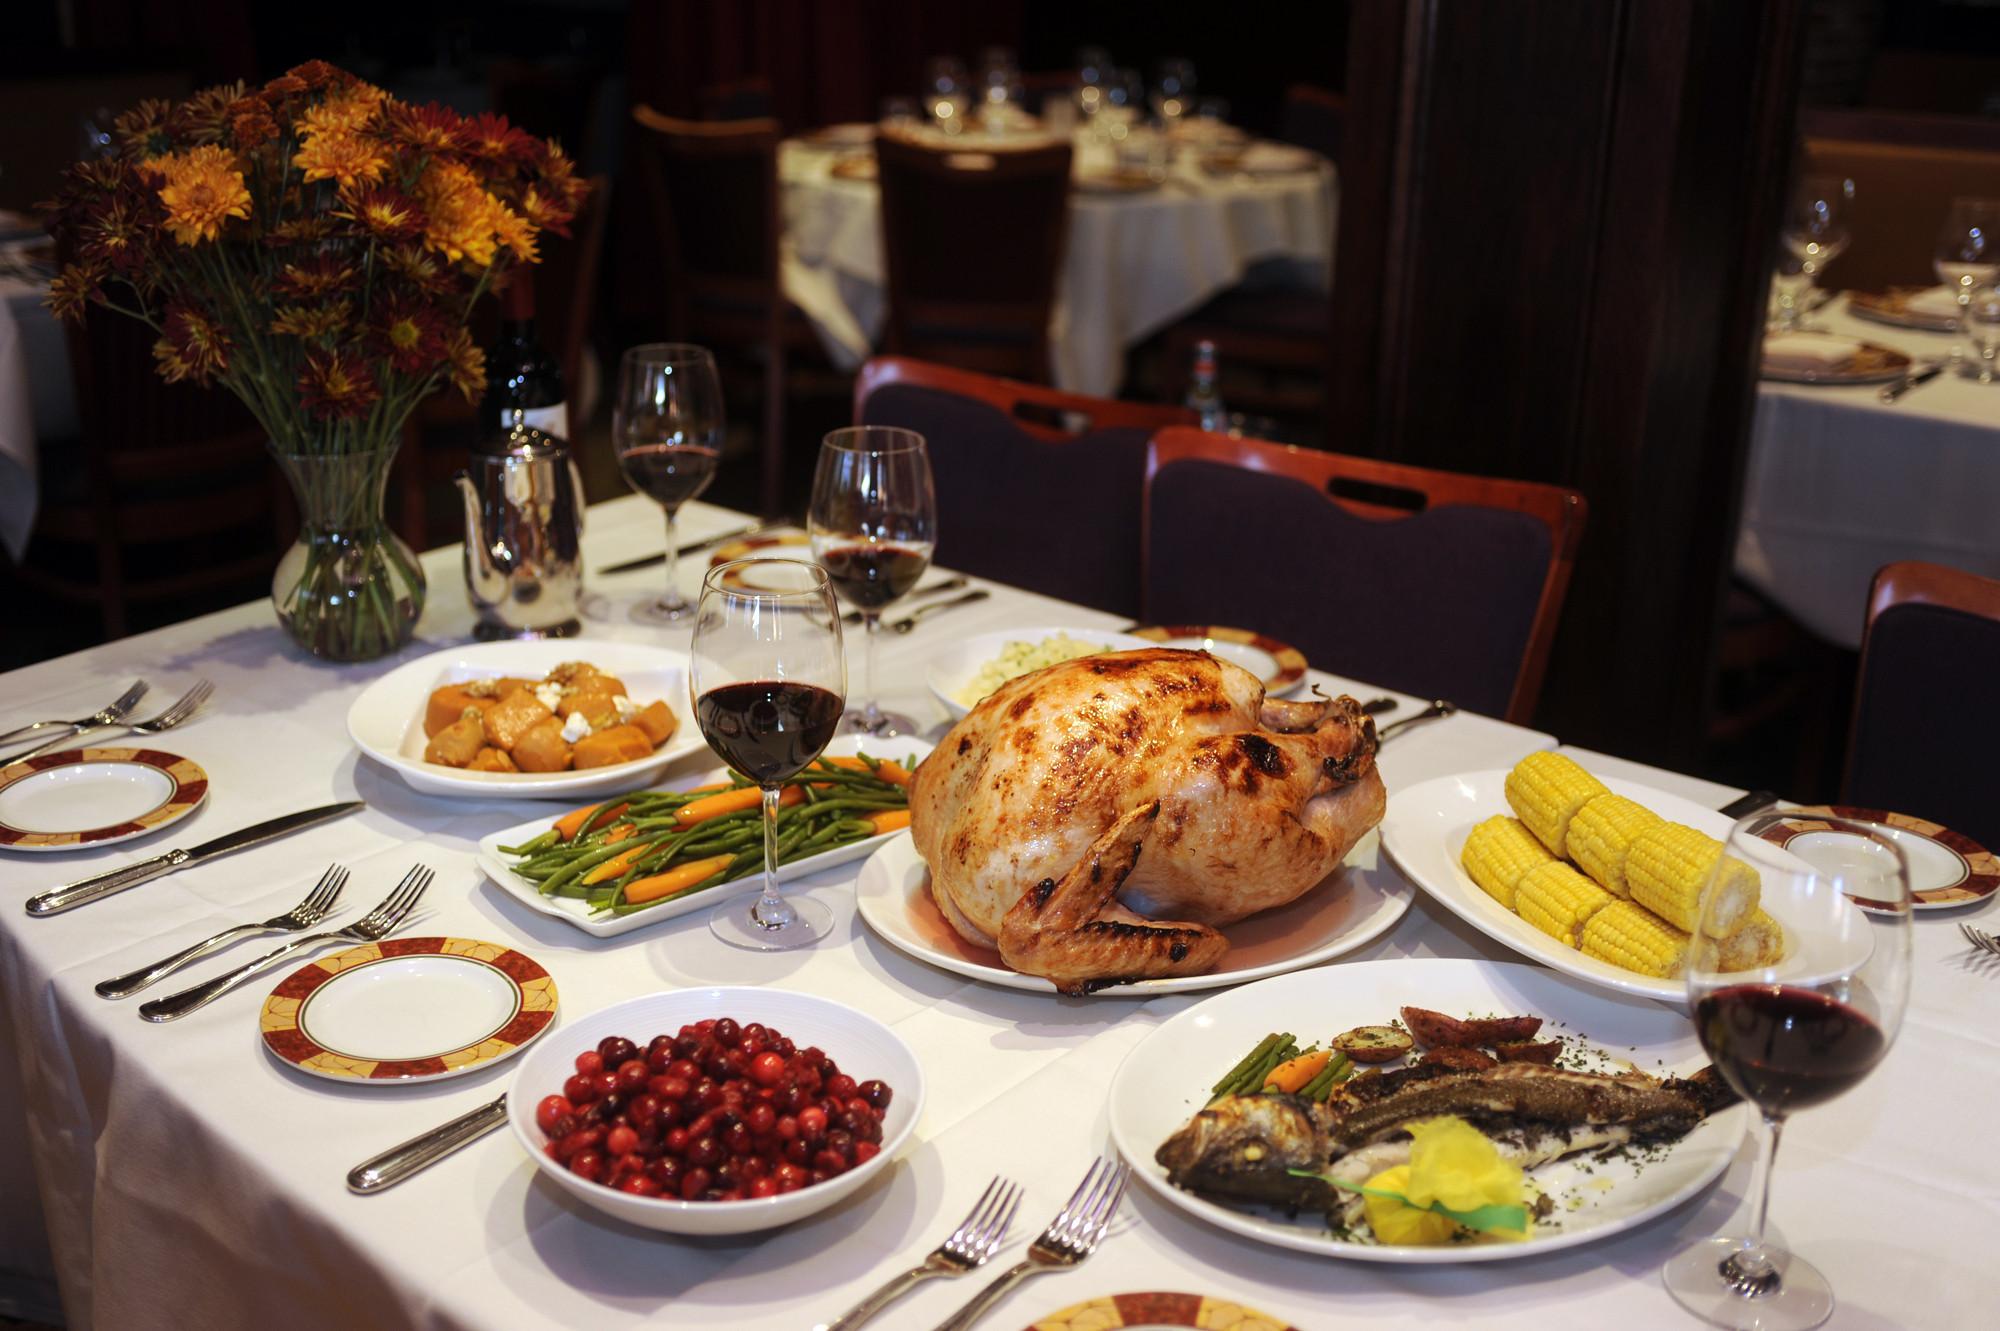 Thanksgiving Dinner Restaurants  Where to dine on Thanksgiving Day in Baltimore